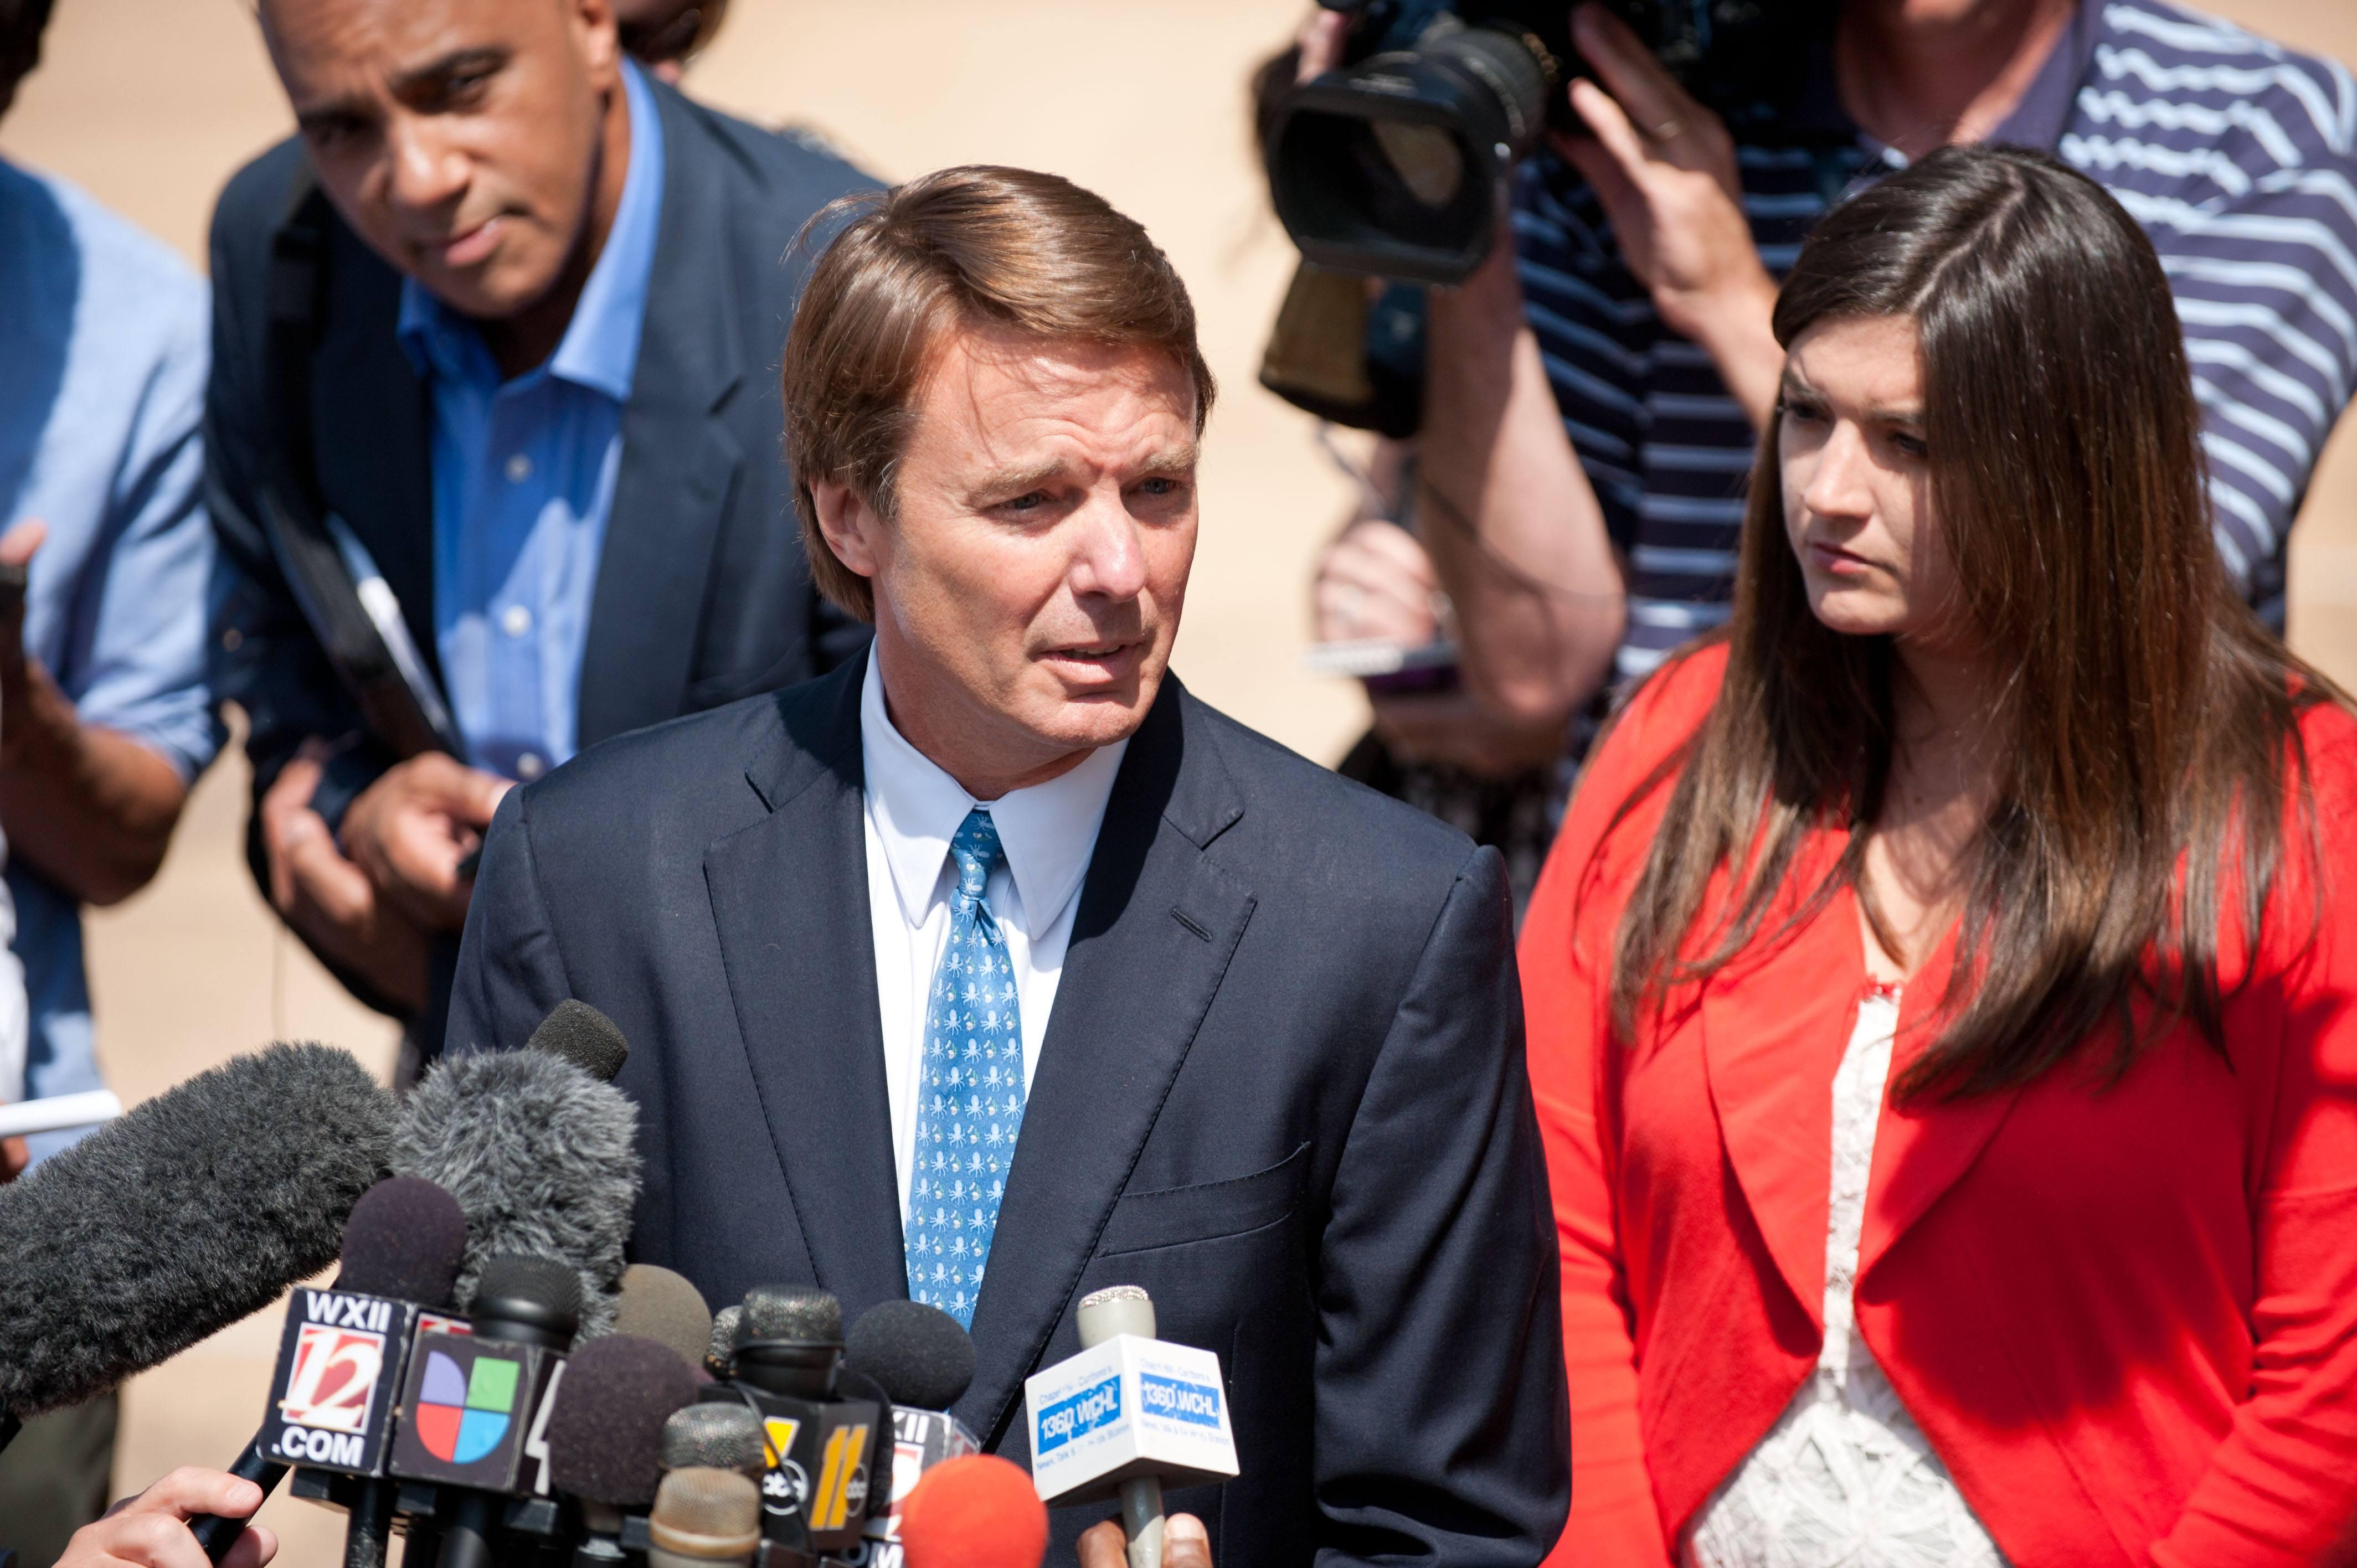 John Edwards affair scandal